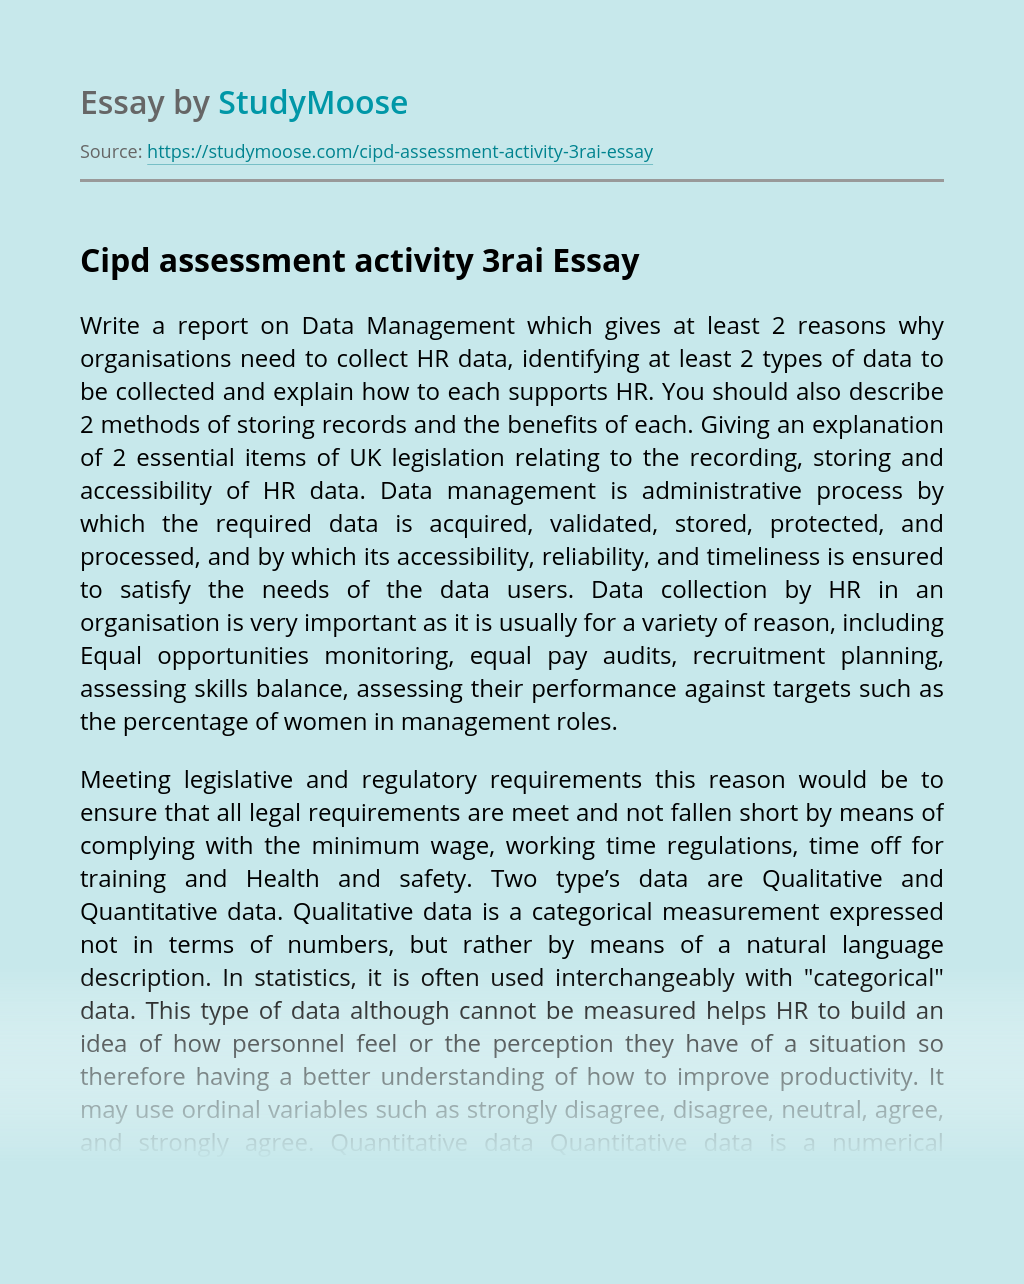 Cipd assessment activity 3rai